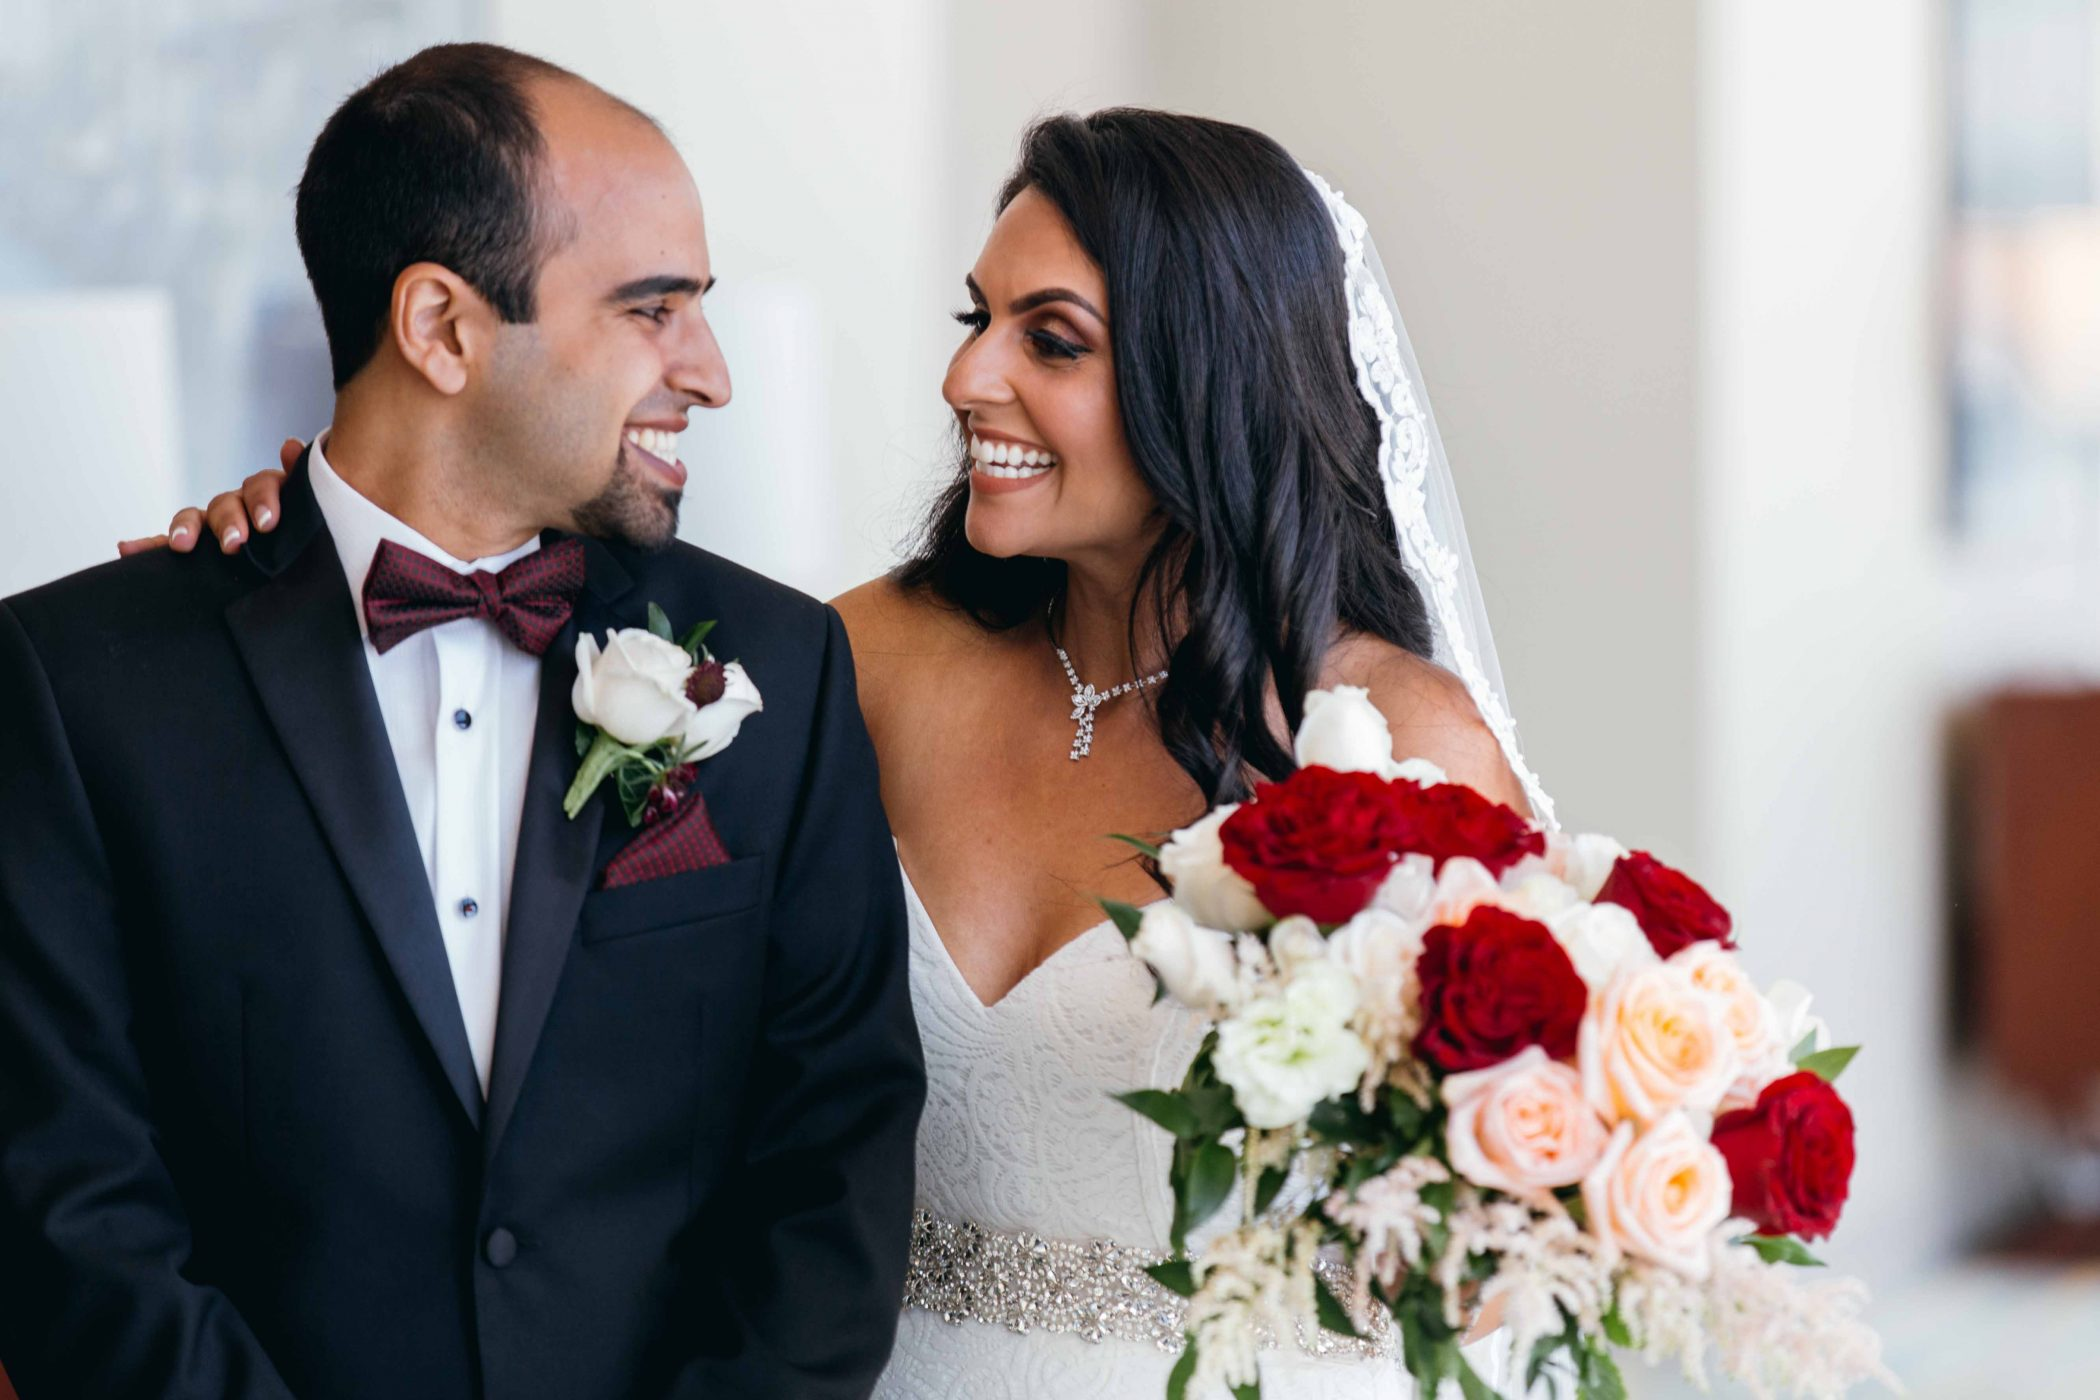 cnw-wedding-photography-1-2100x1400.jpg